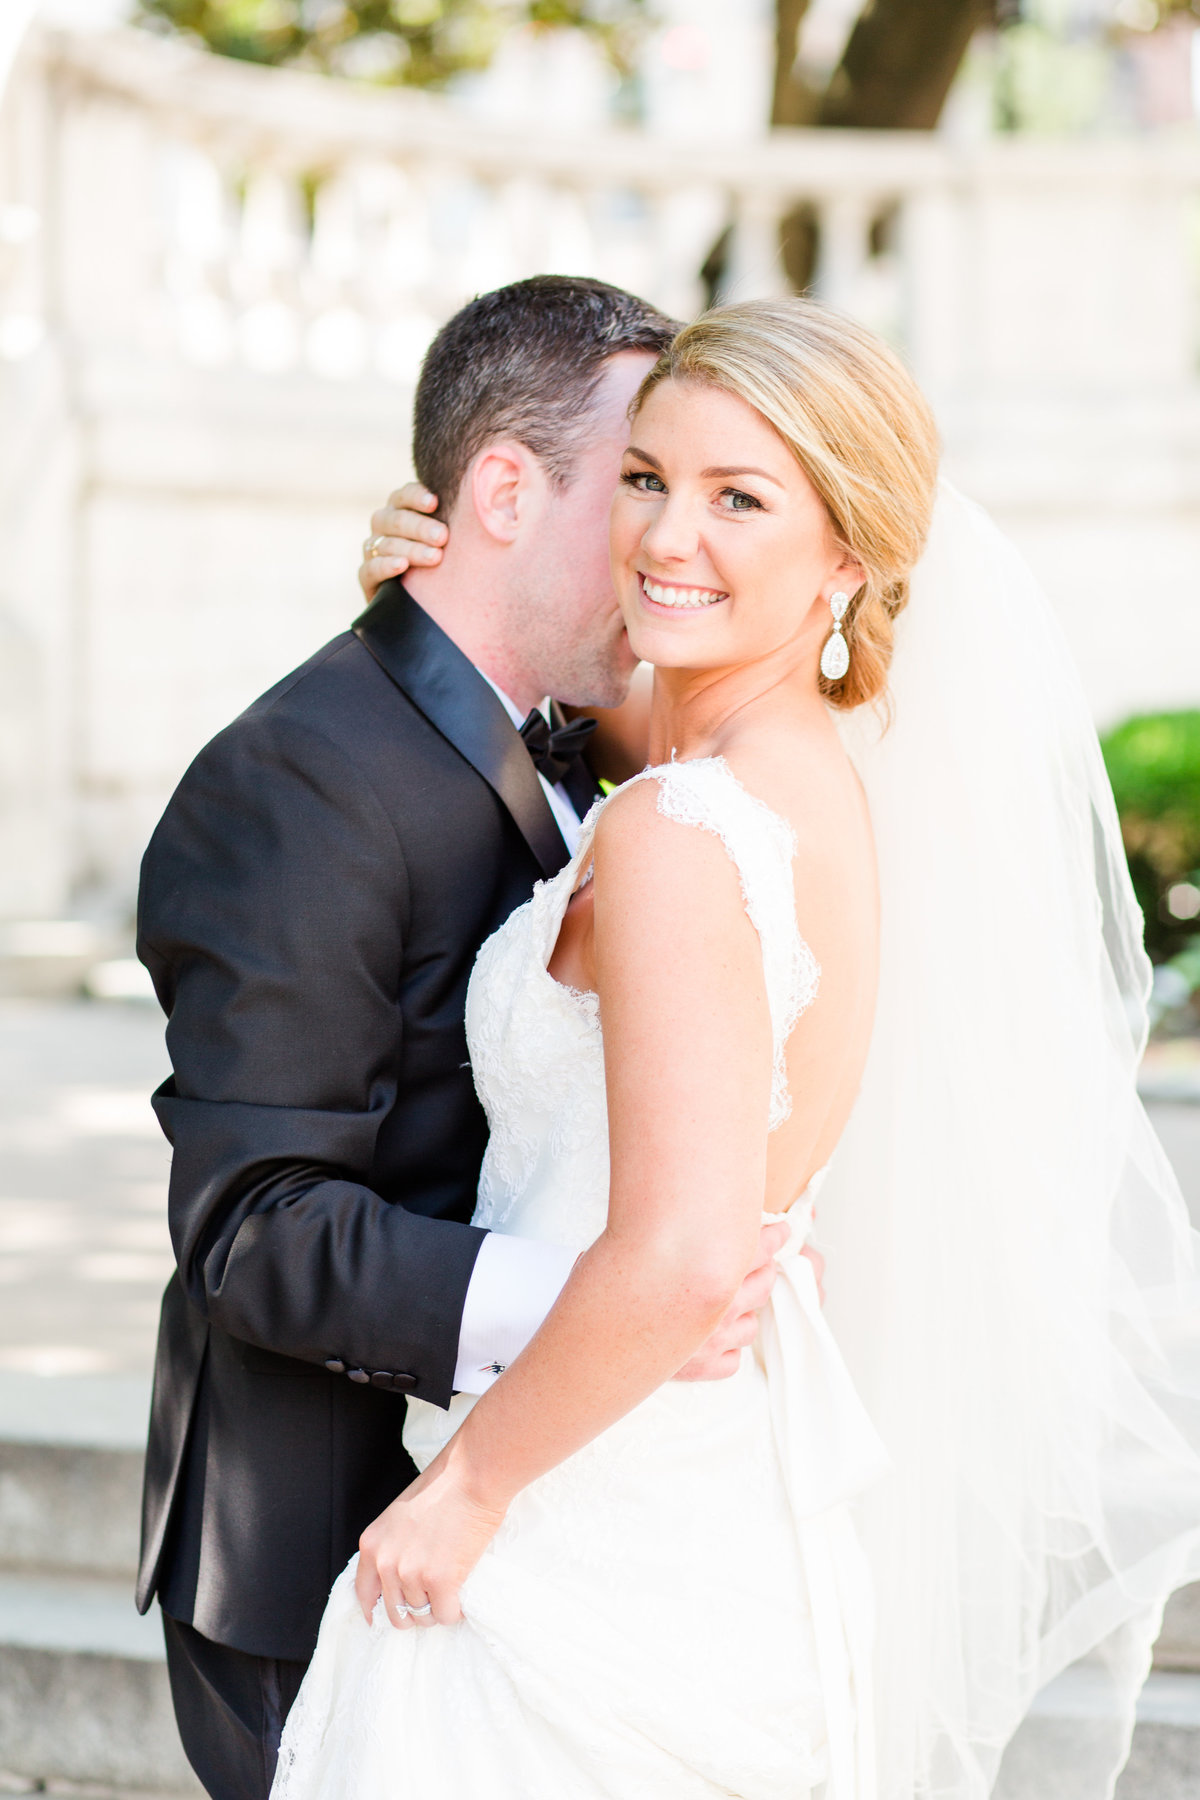 baltimore-maryland-wedding-mt-vernon-navin-bethanne-arthur-